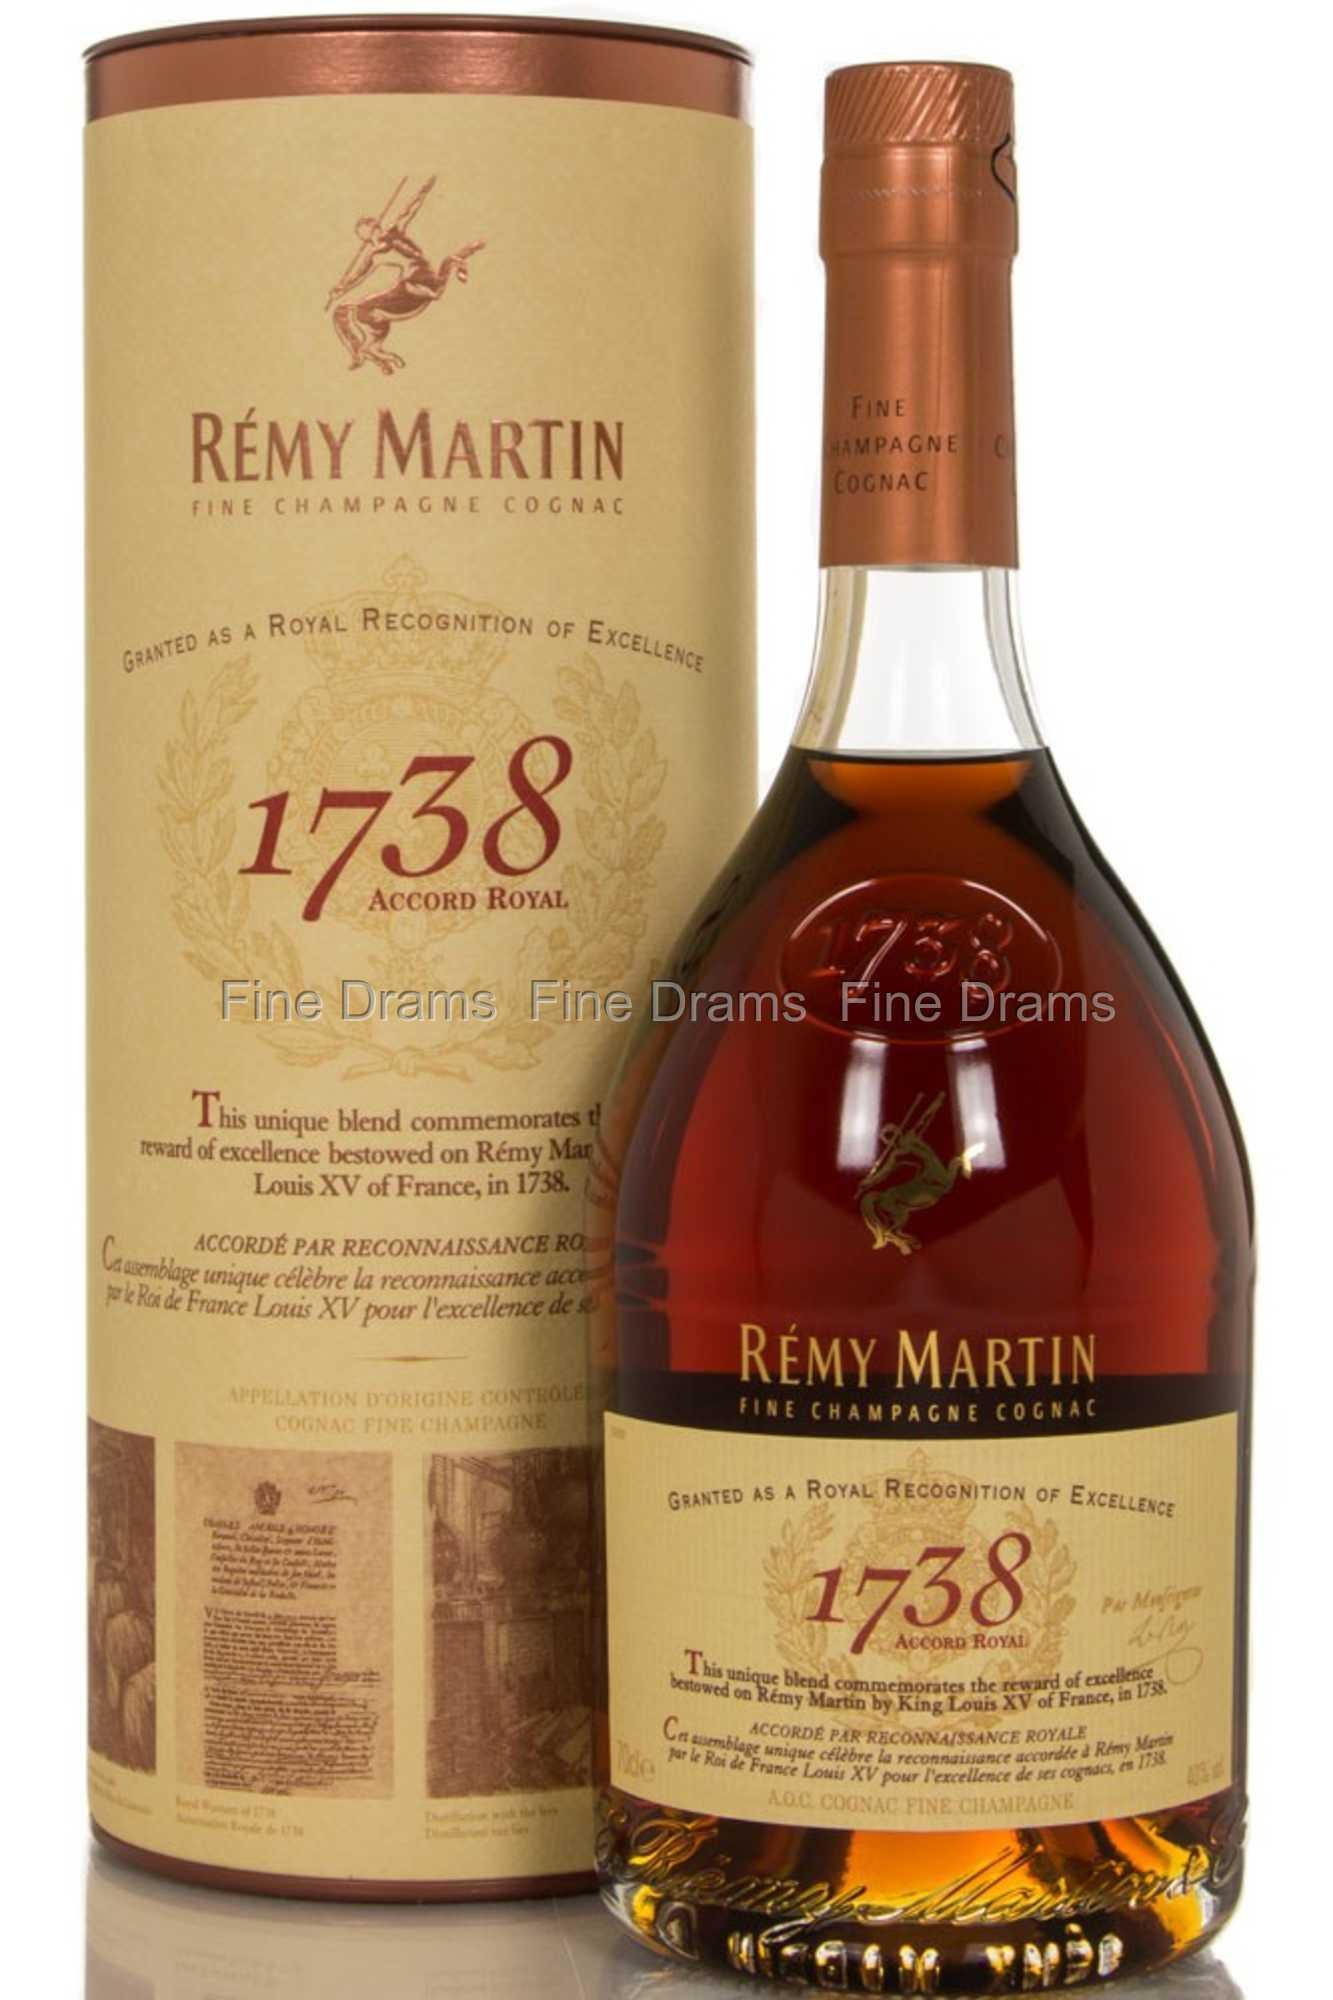 Remy martin 39 1738 39 accord royal cognac - Tennessee cognac ...